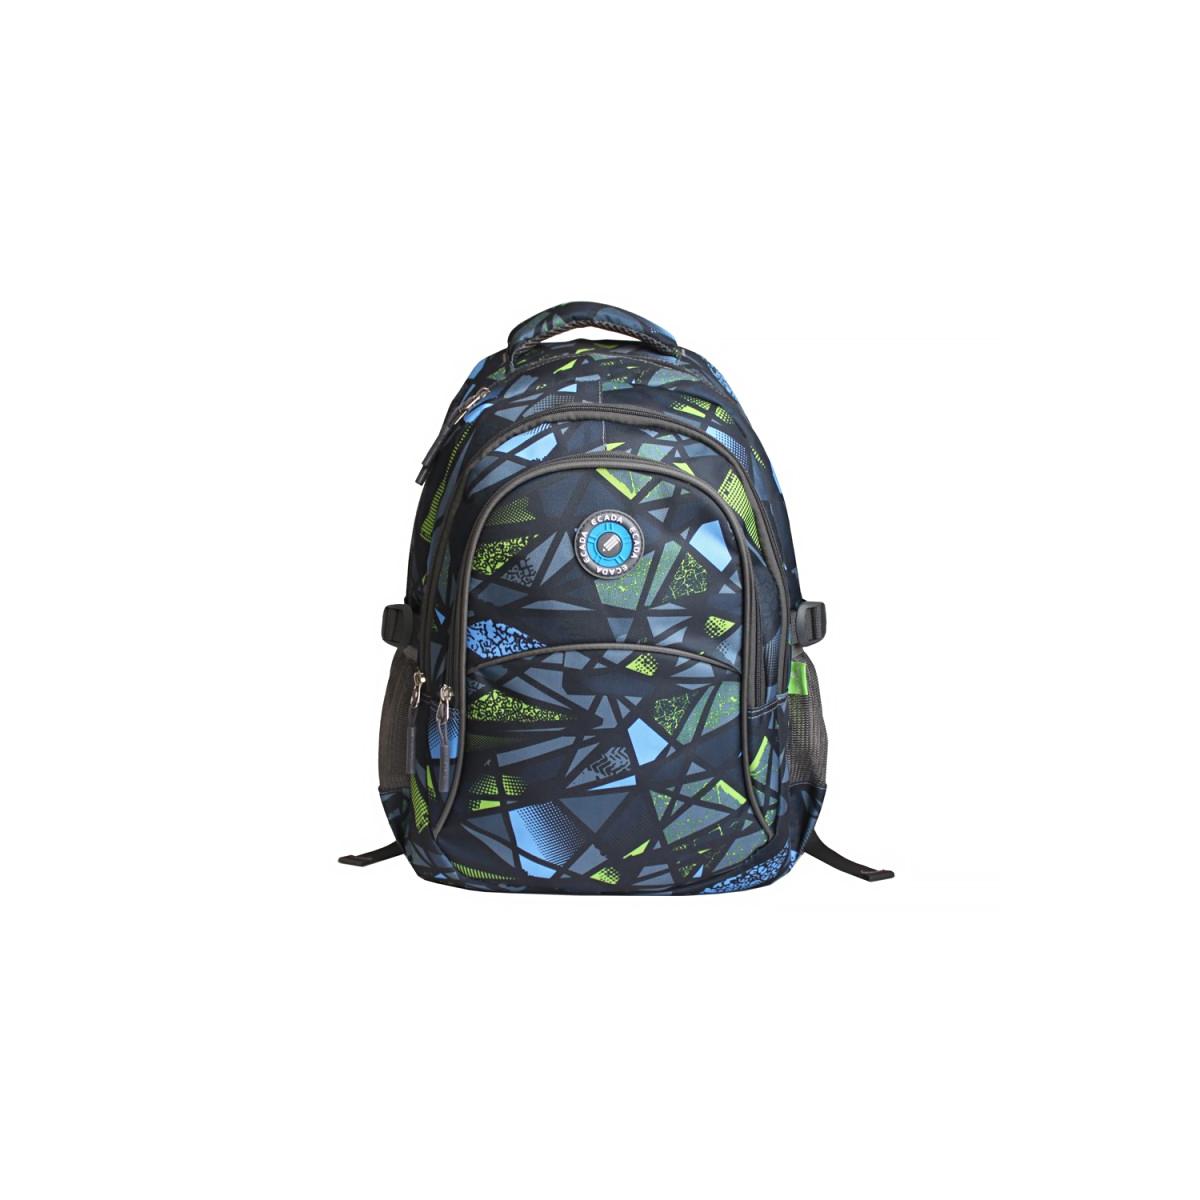 Ghiozdan Școlar Pentru Adolescenți, Albastru & Gri, Abstract, Ecada, 61460